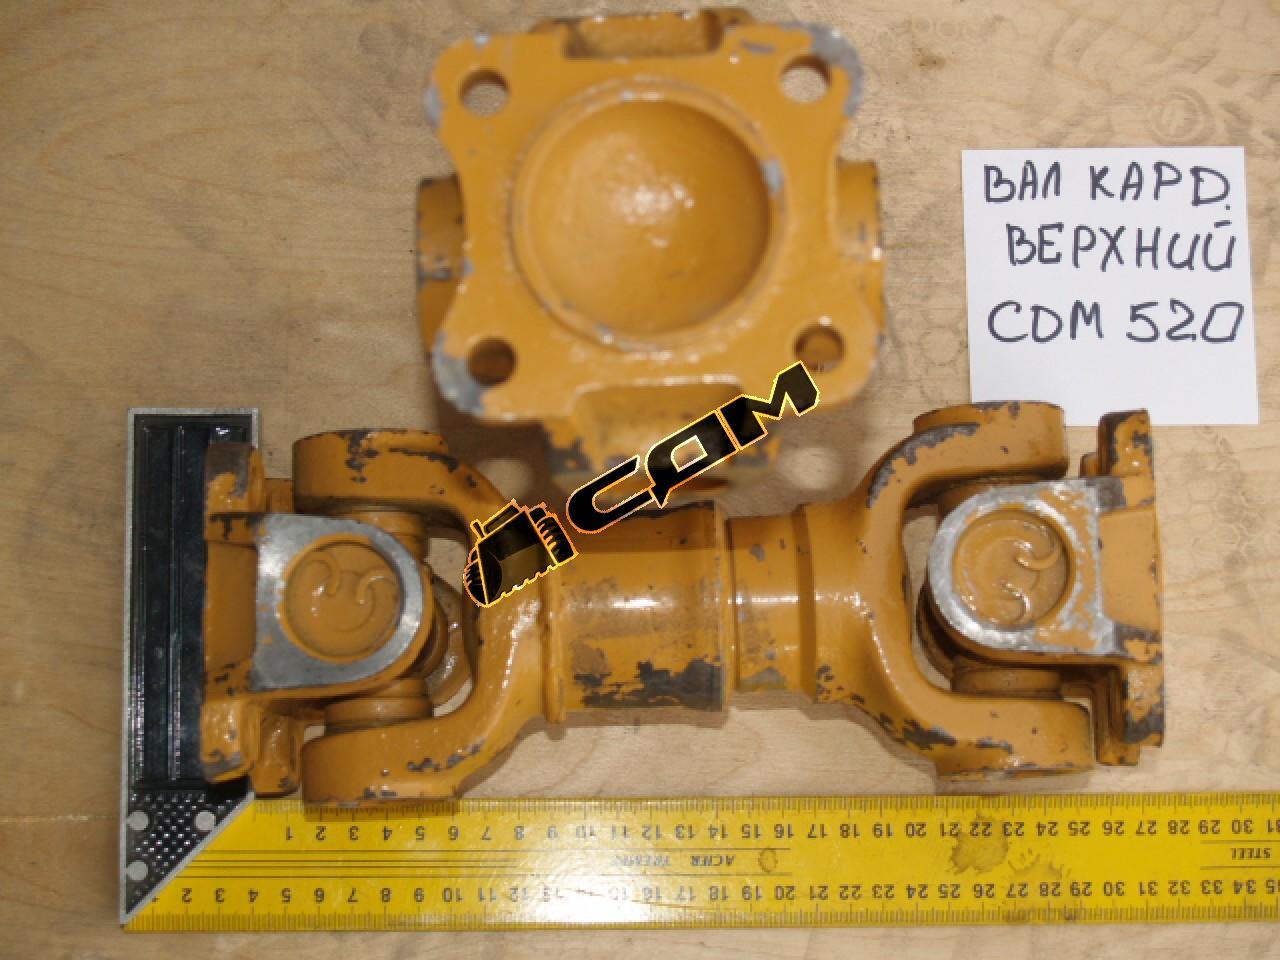 Вал карданный CDM520 верхний  YZ18JF.4.2A